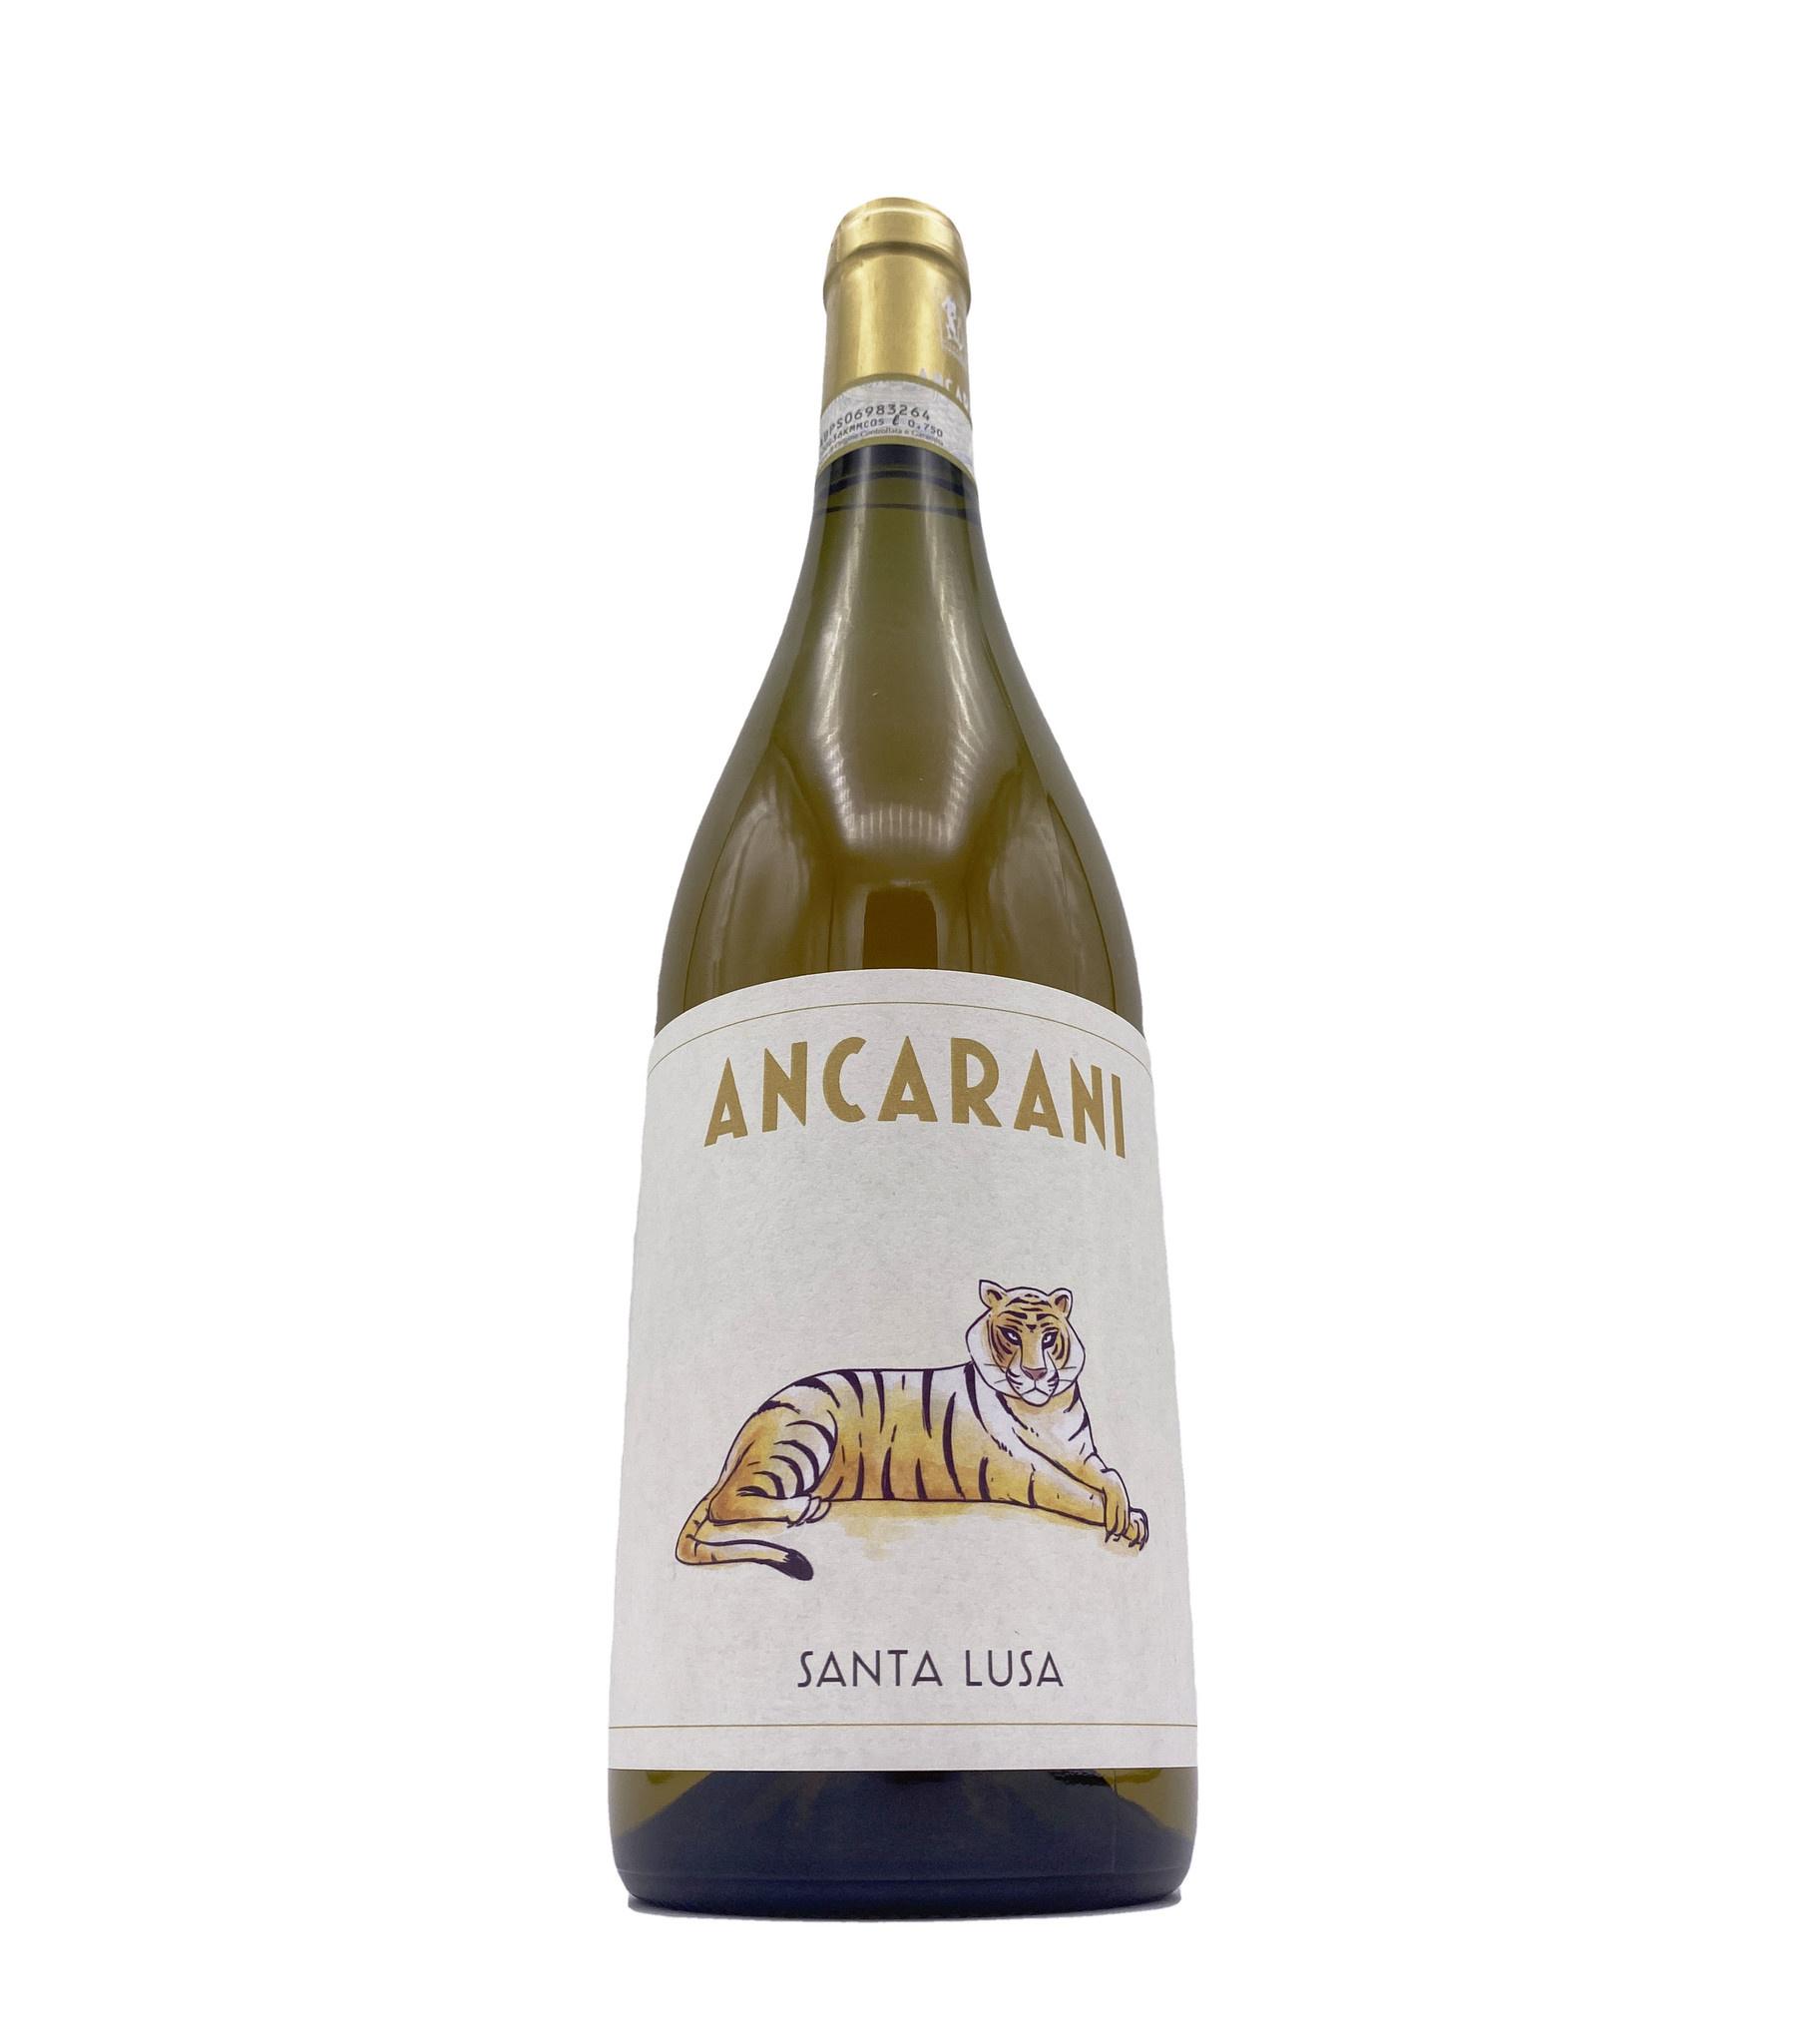 Albana Secco Santa Lusa 2019 Ancarani